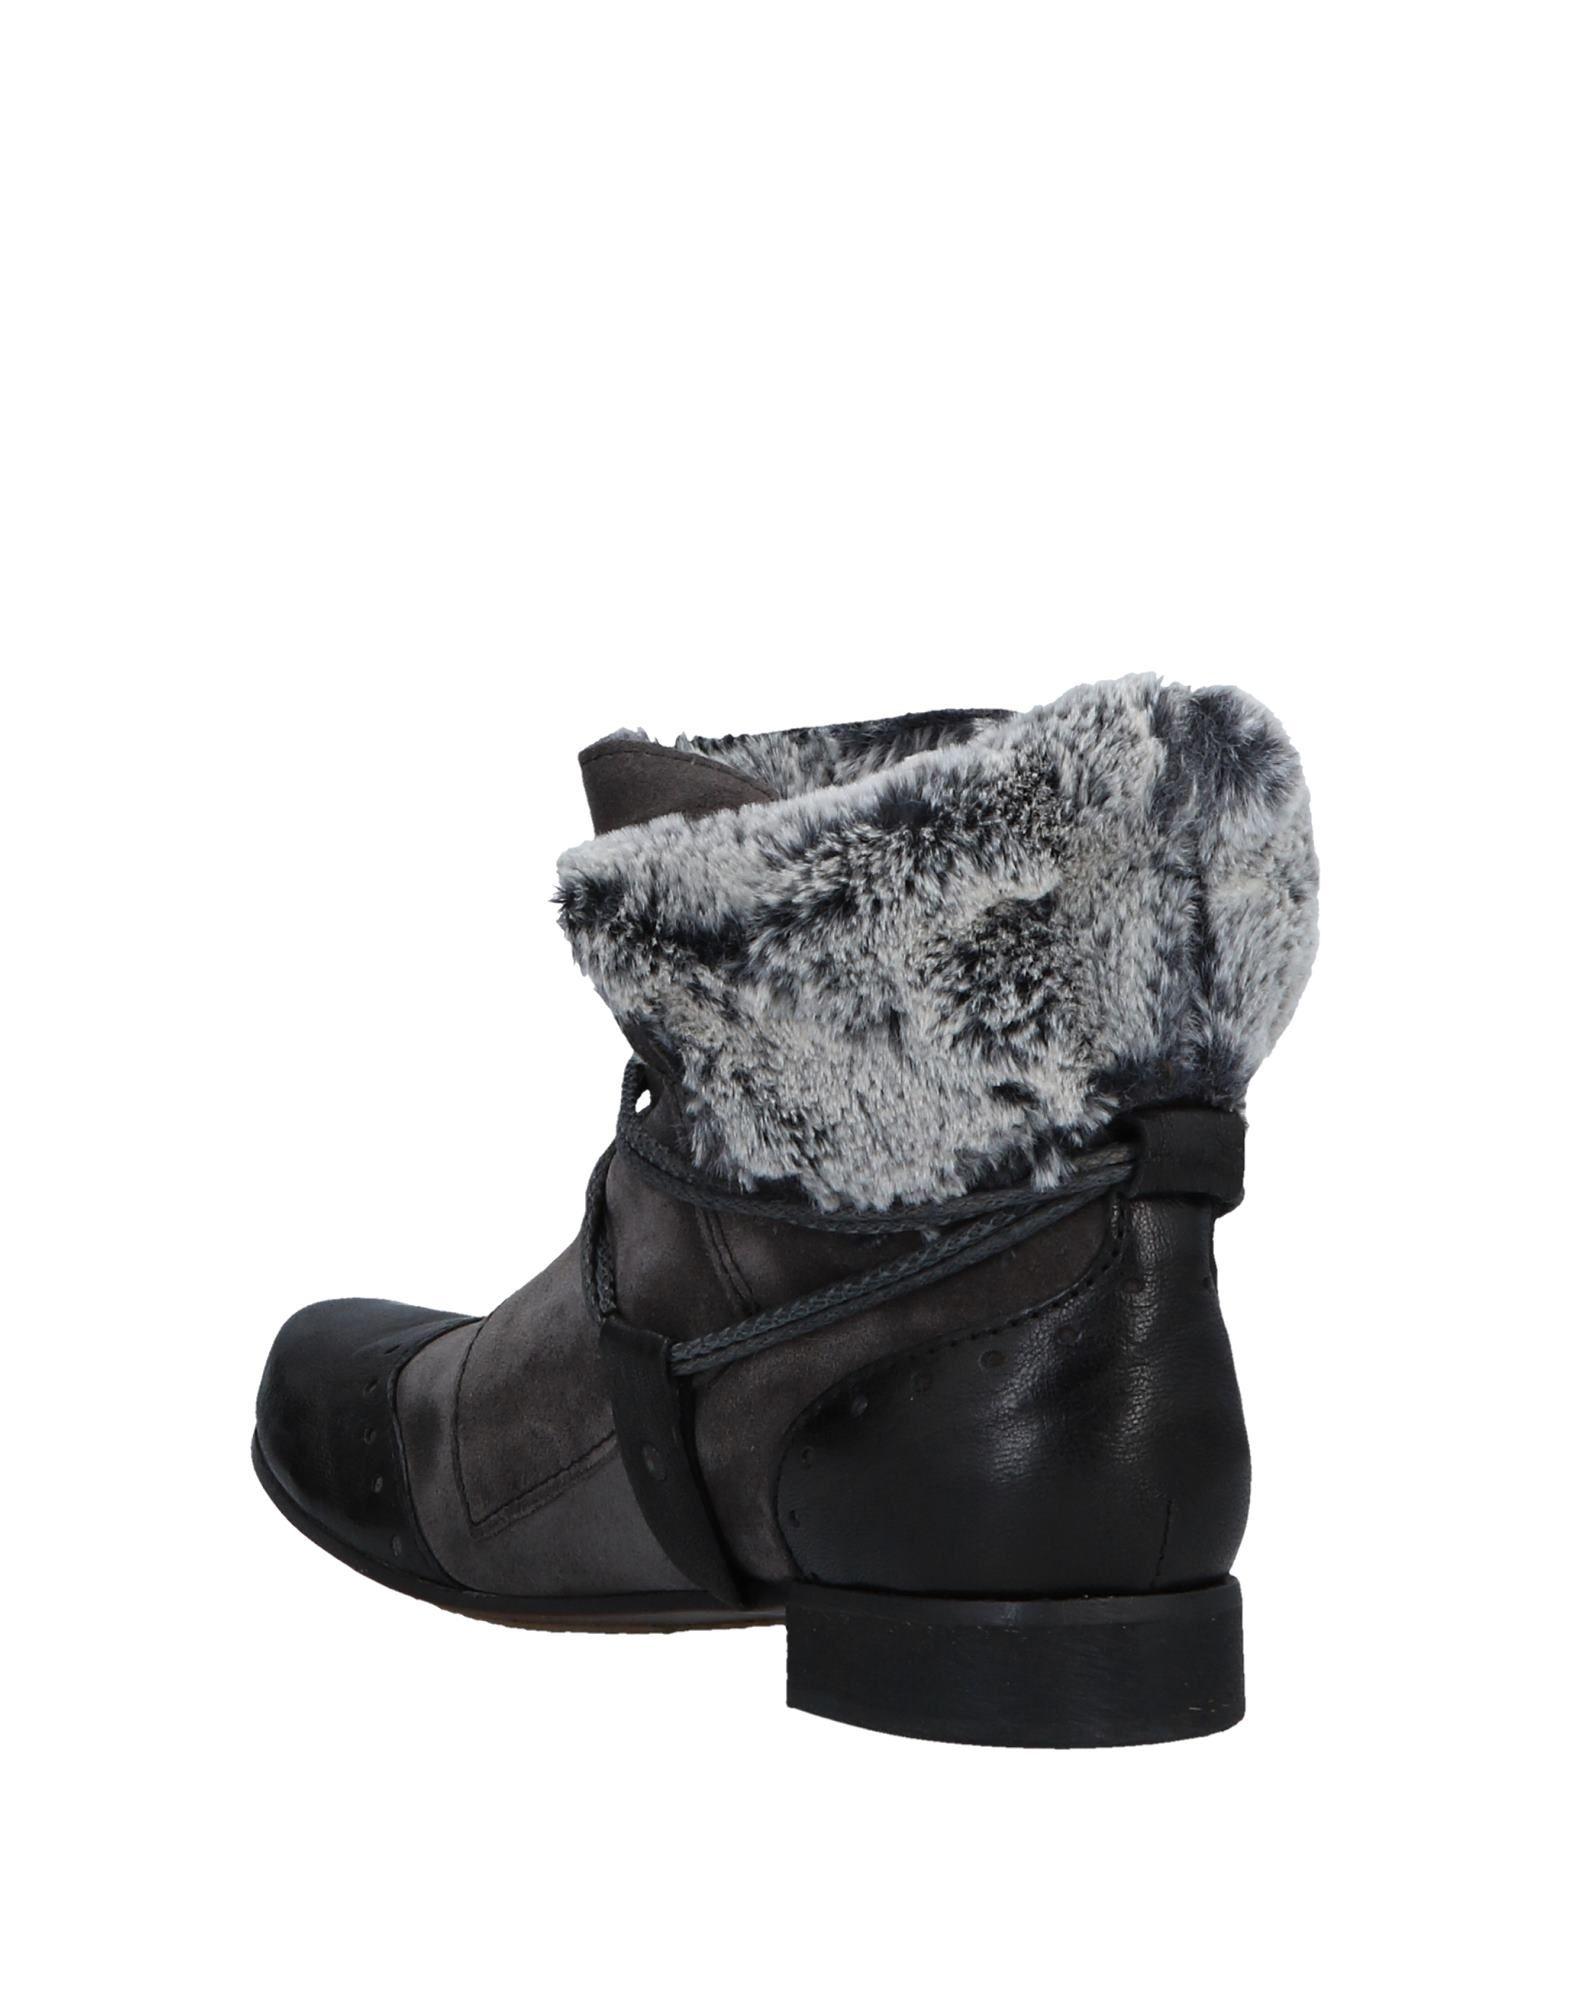 Gut um Stiefelette billige Schuhe zu tragenClocharme Stiefelette um Damen 11529339VC e4d7c5